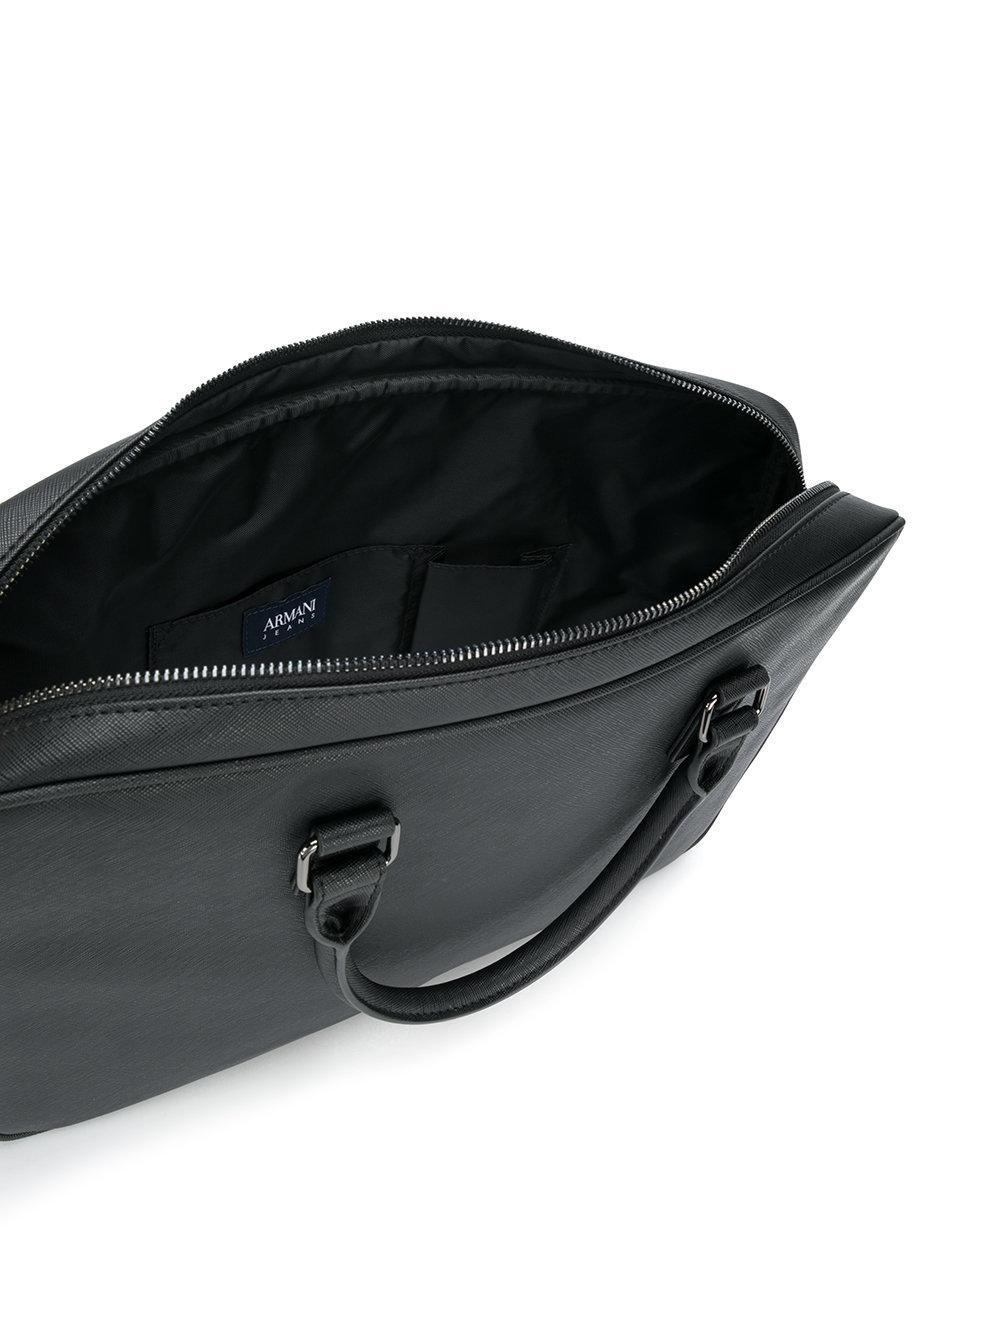 Lyst - Armani Jeans Crossbody Laptop Bag in Black for Men 330f80b11d9df